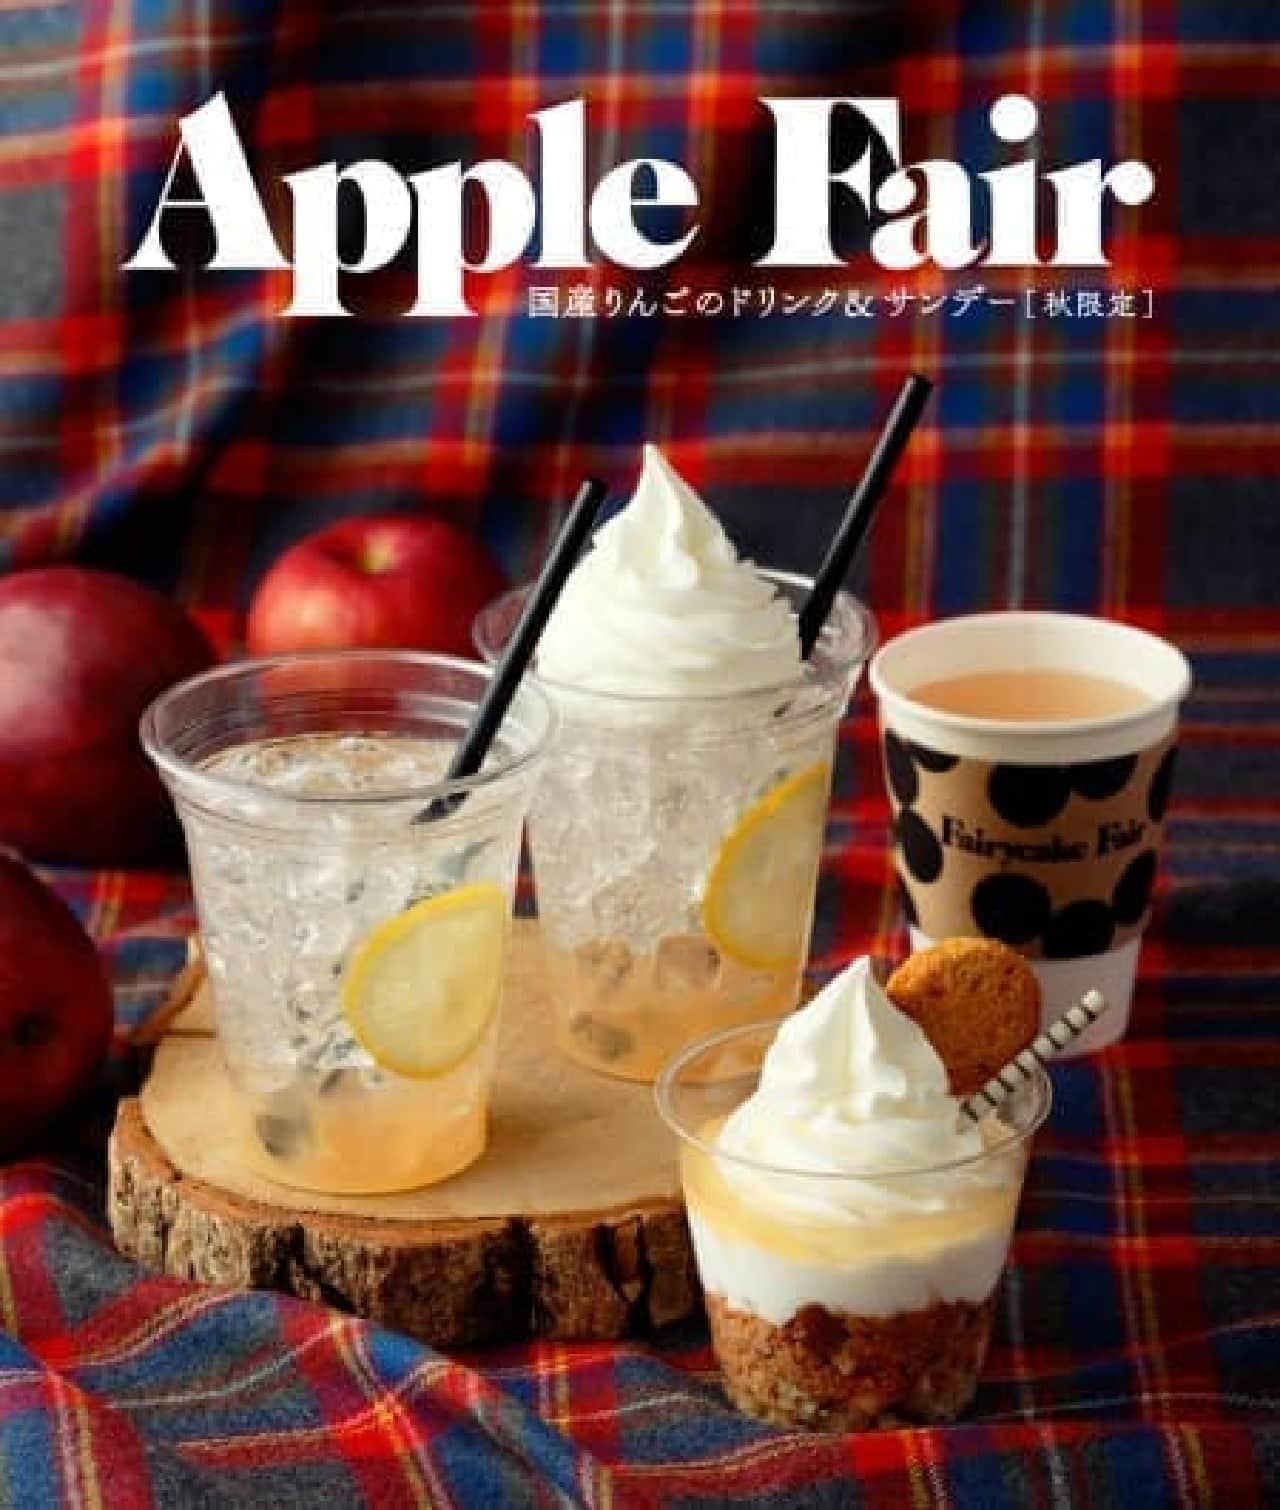 Fairycake Fair 国産りんごを使ったドリンク・スイーツ